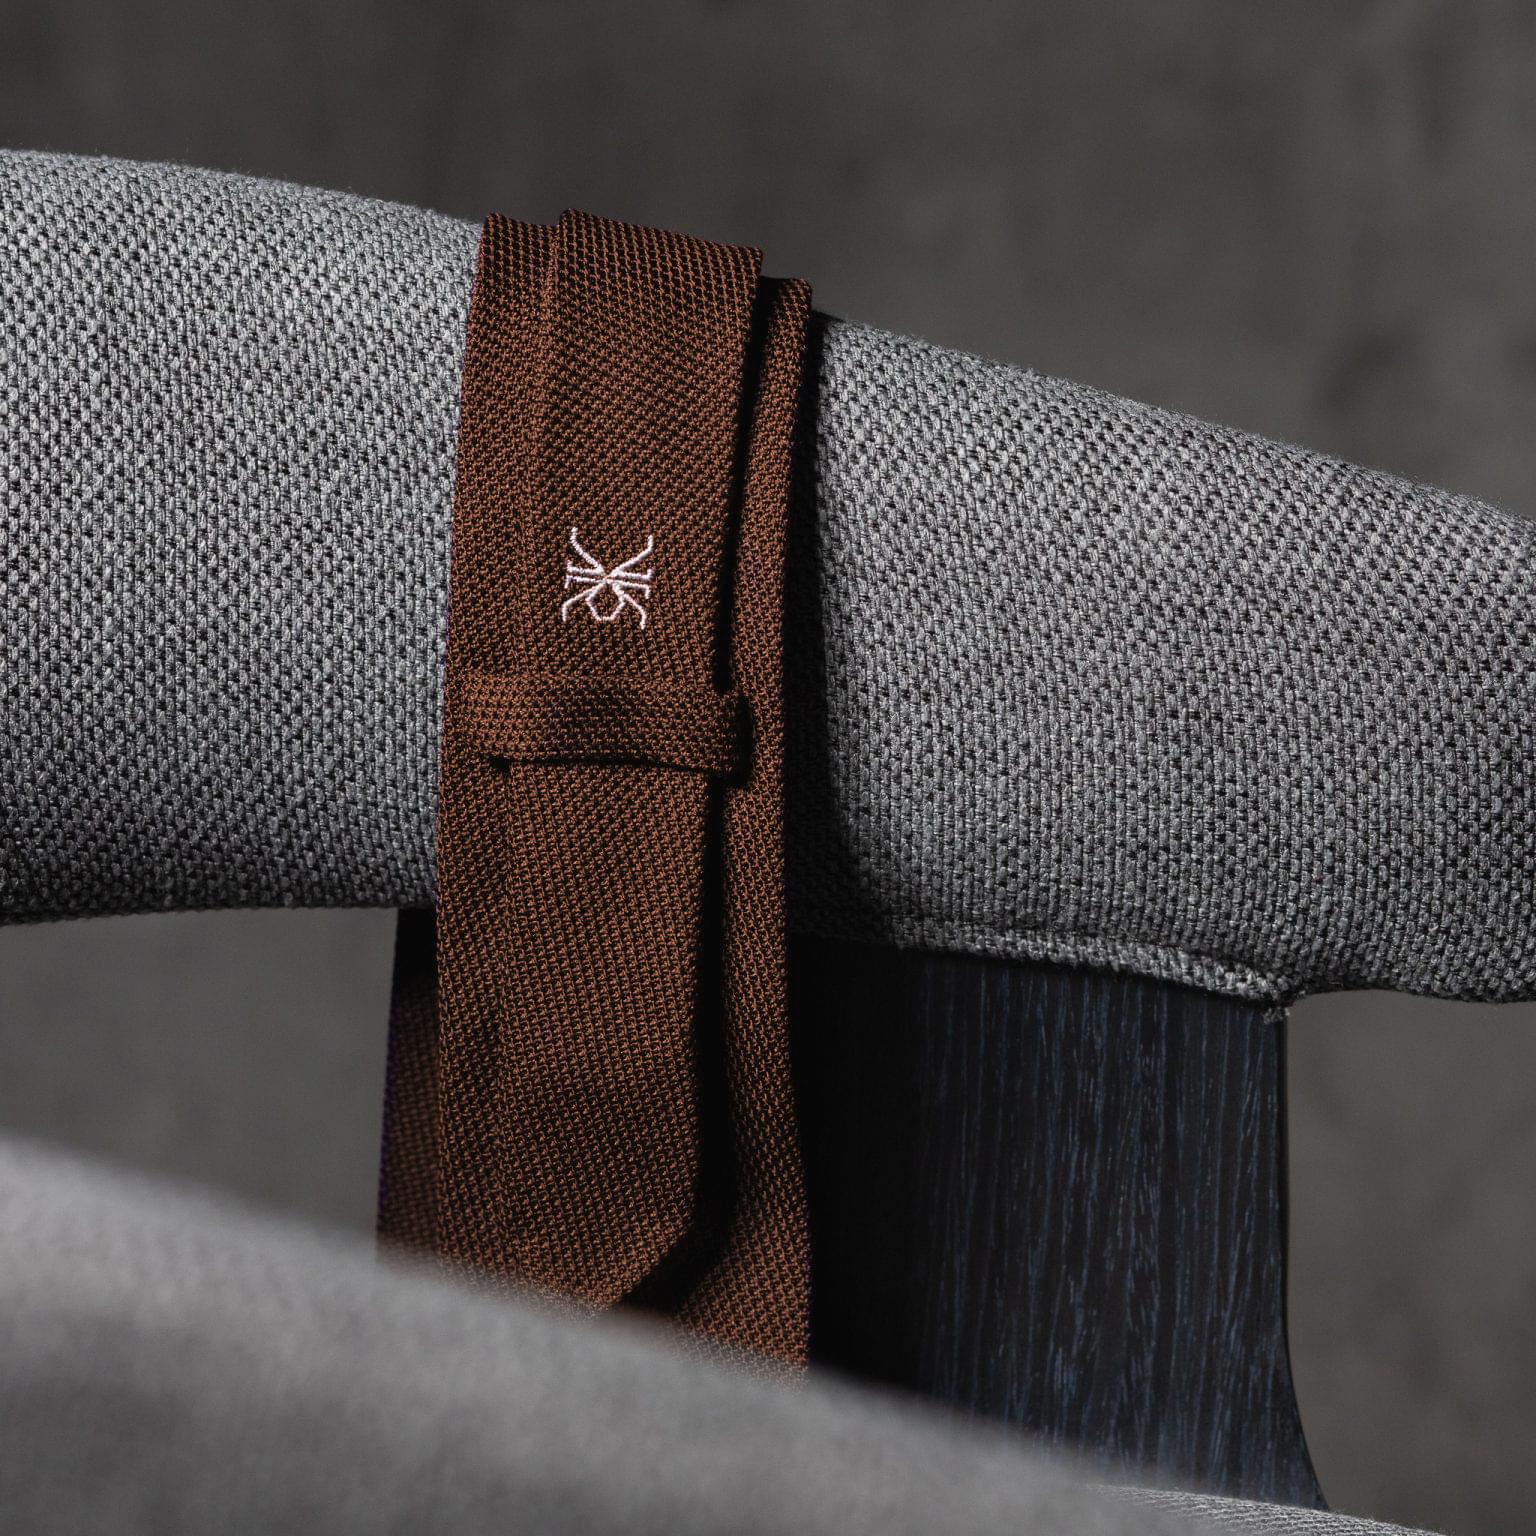 GRENADINE 0152 Tie with initials The Seëlk – 3